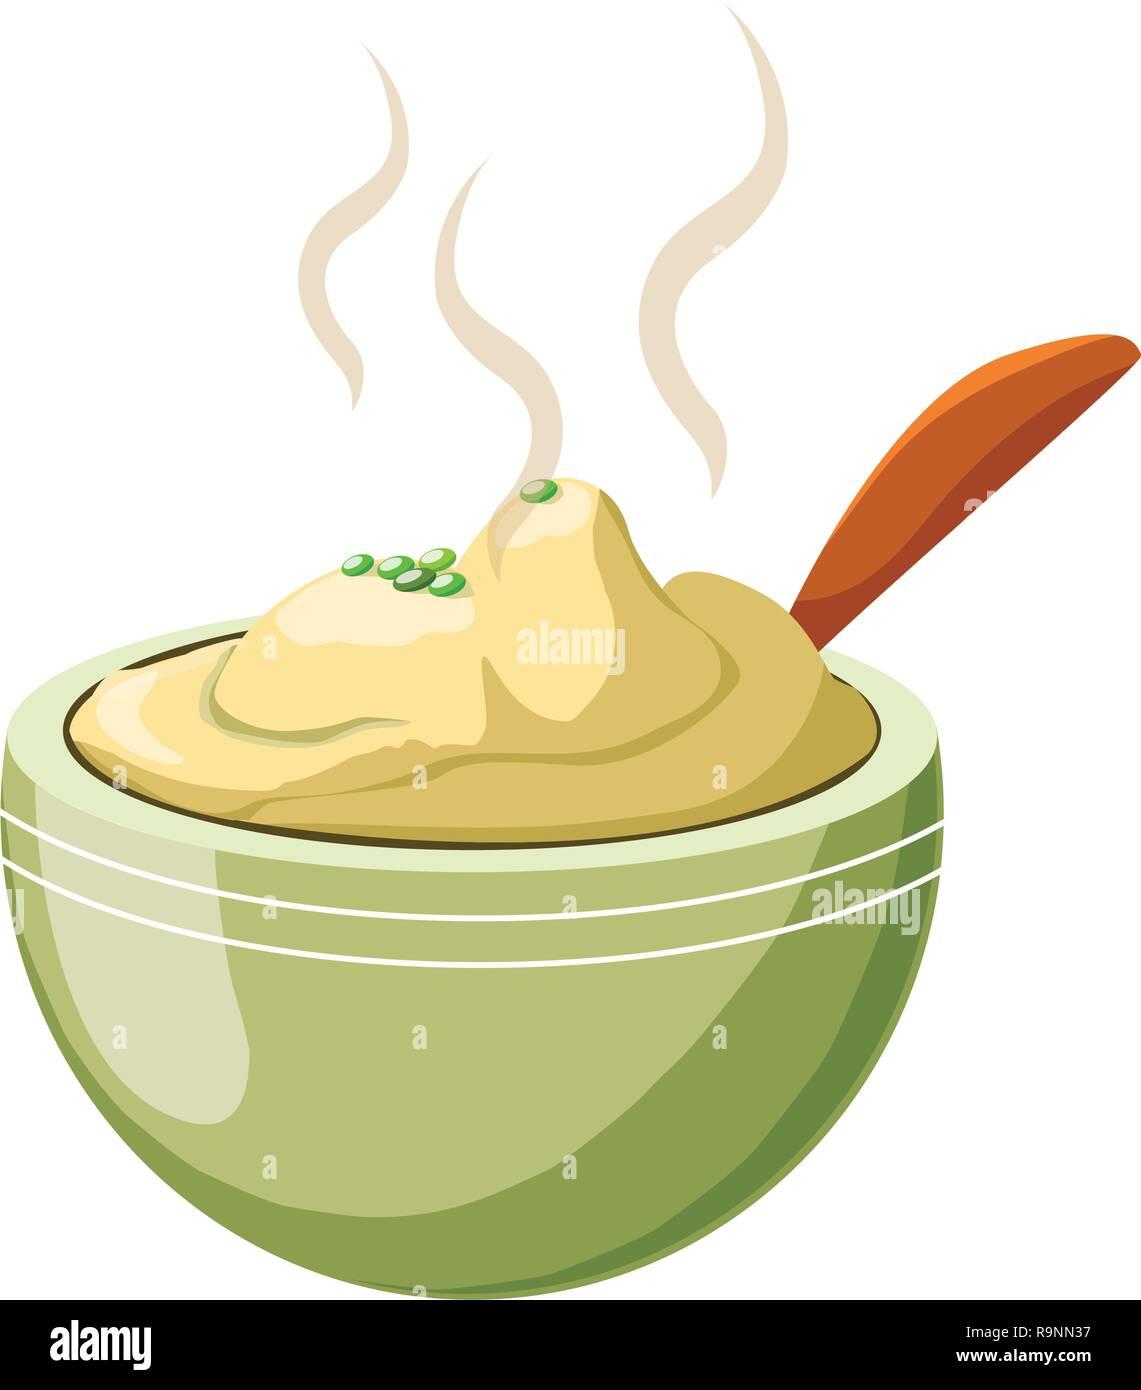 mashed potatoes over white background, colorful design, vector illustration - Stock Image